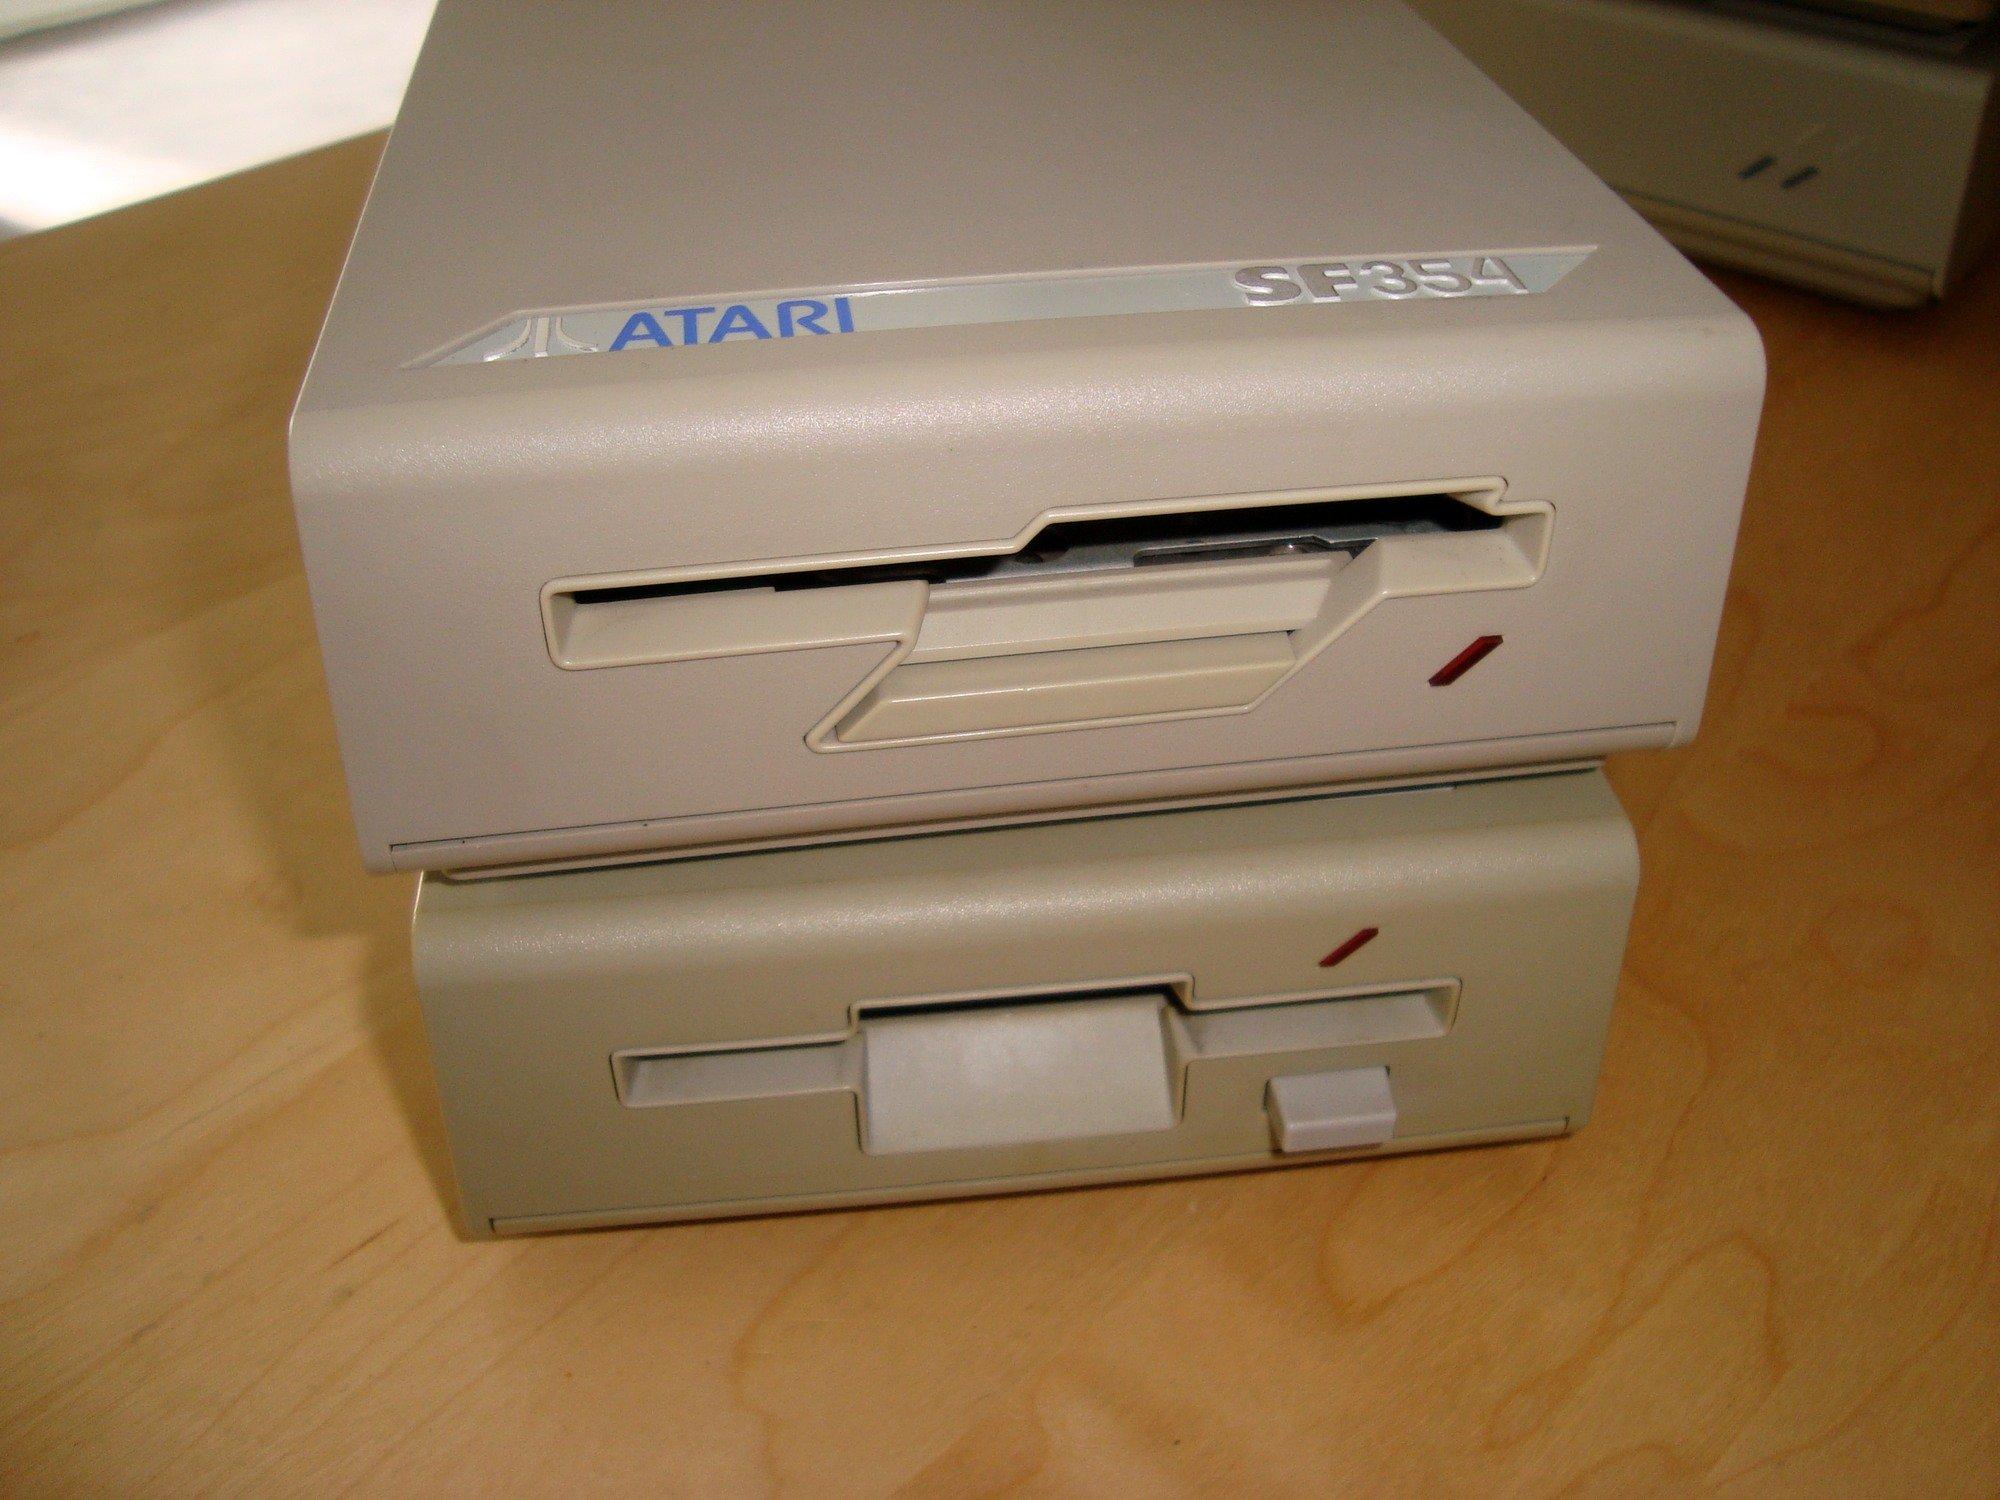 [TEST] Lecteurs disquettes externes SF354/SF314 - Atari ST 201019123922443803